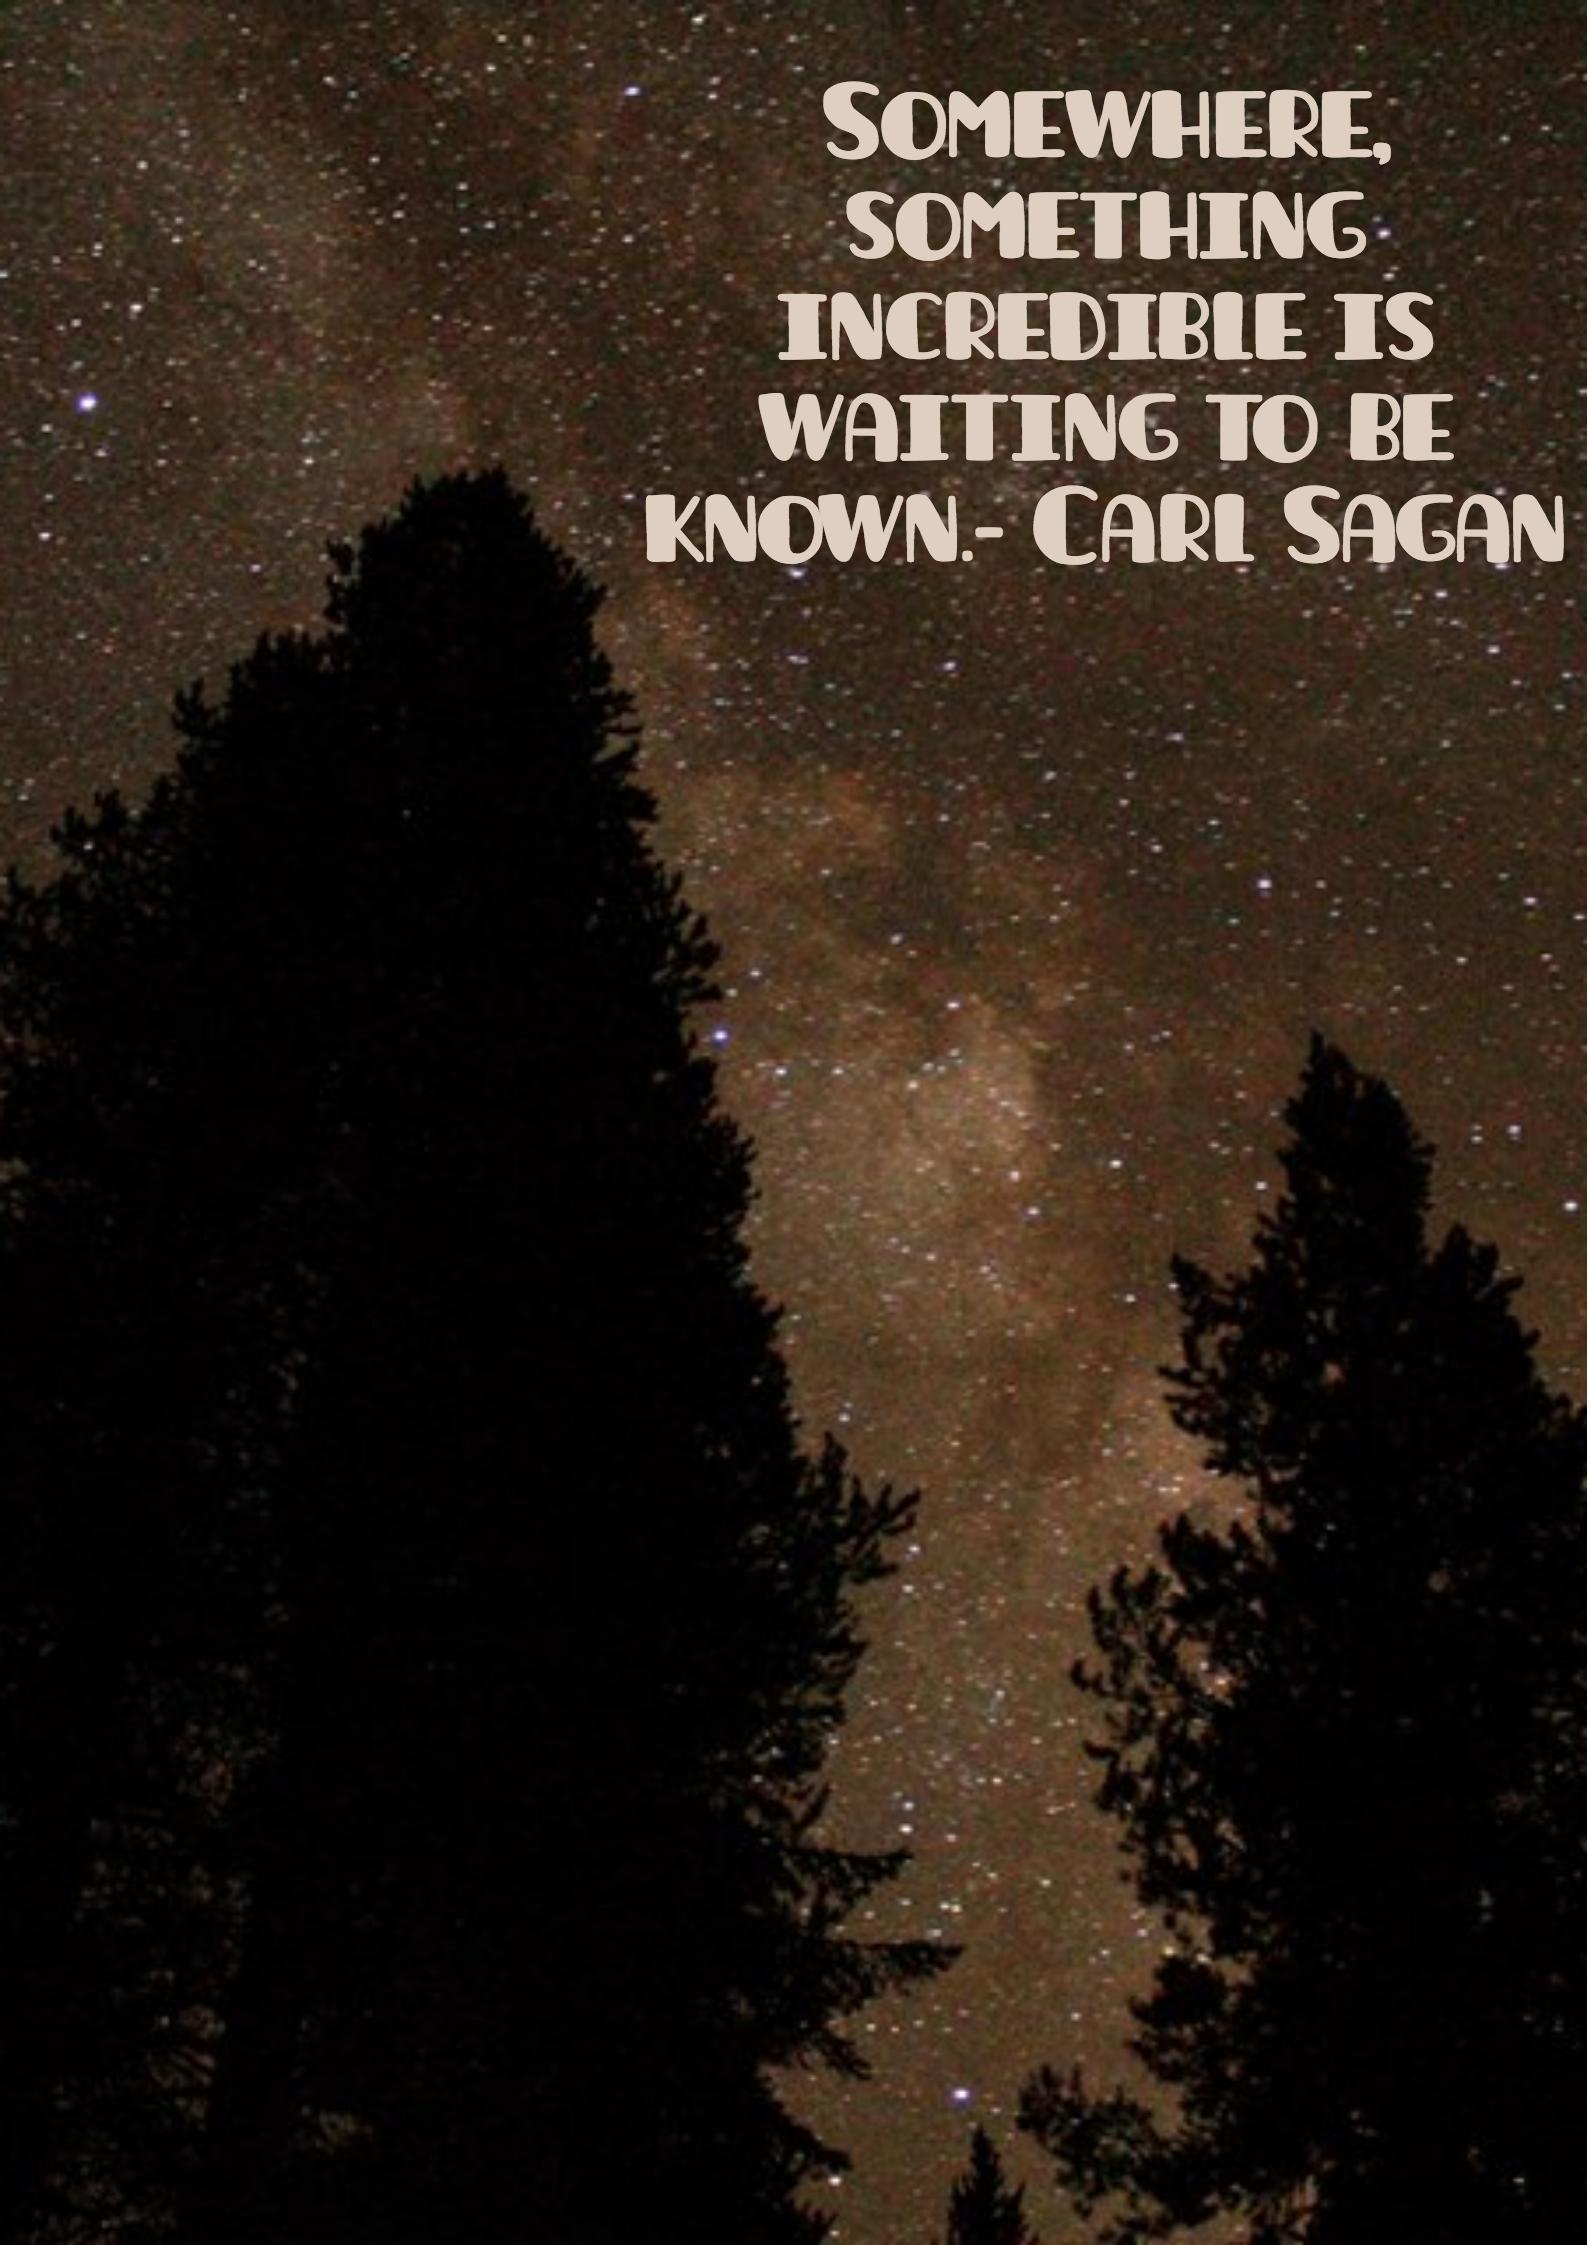 """Somewhere, something incredible is waiting to be known."" – Carl Sagan[1600×2200]"